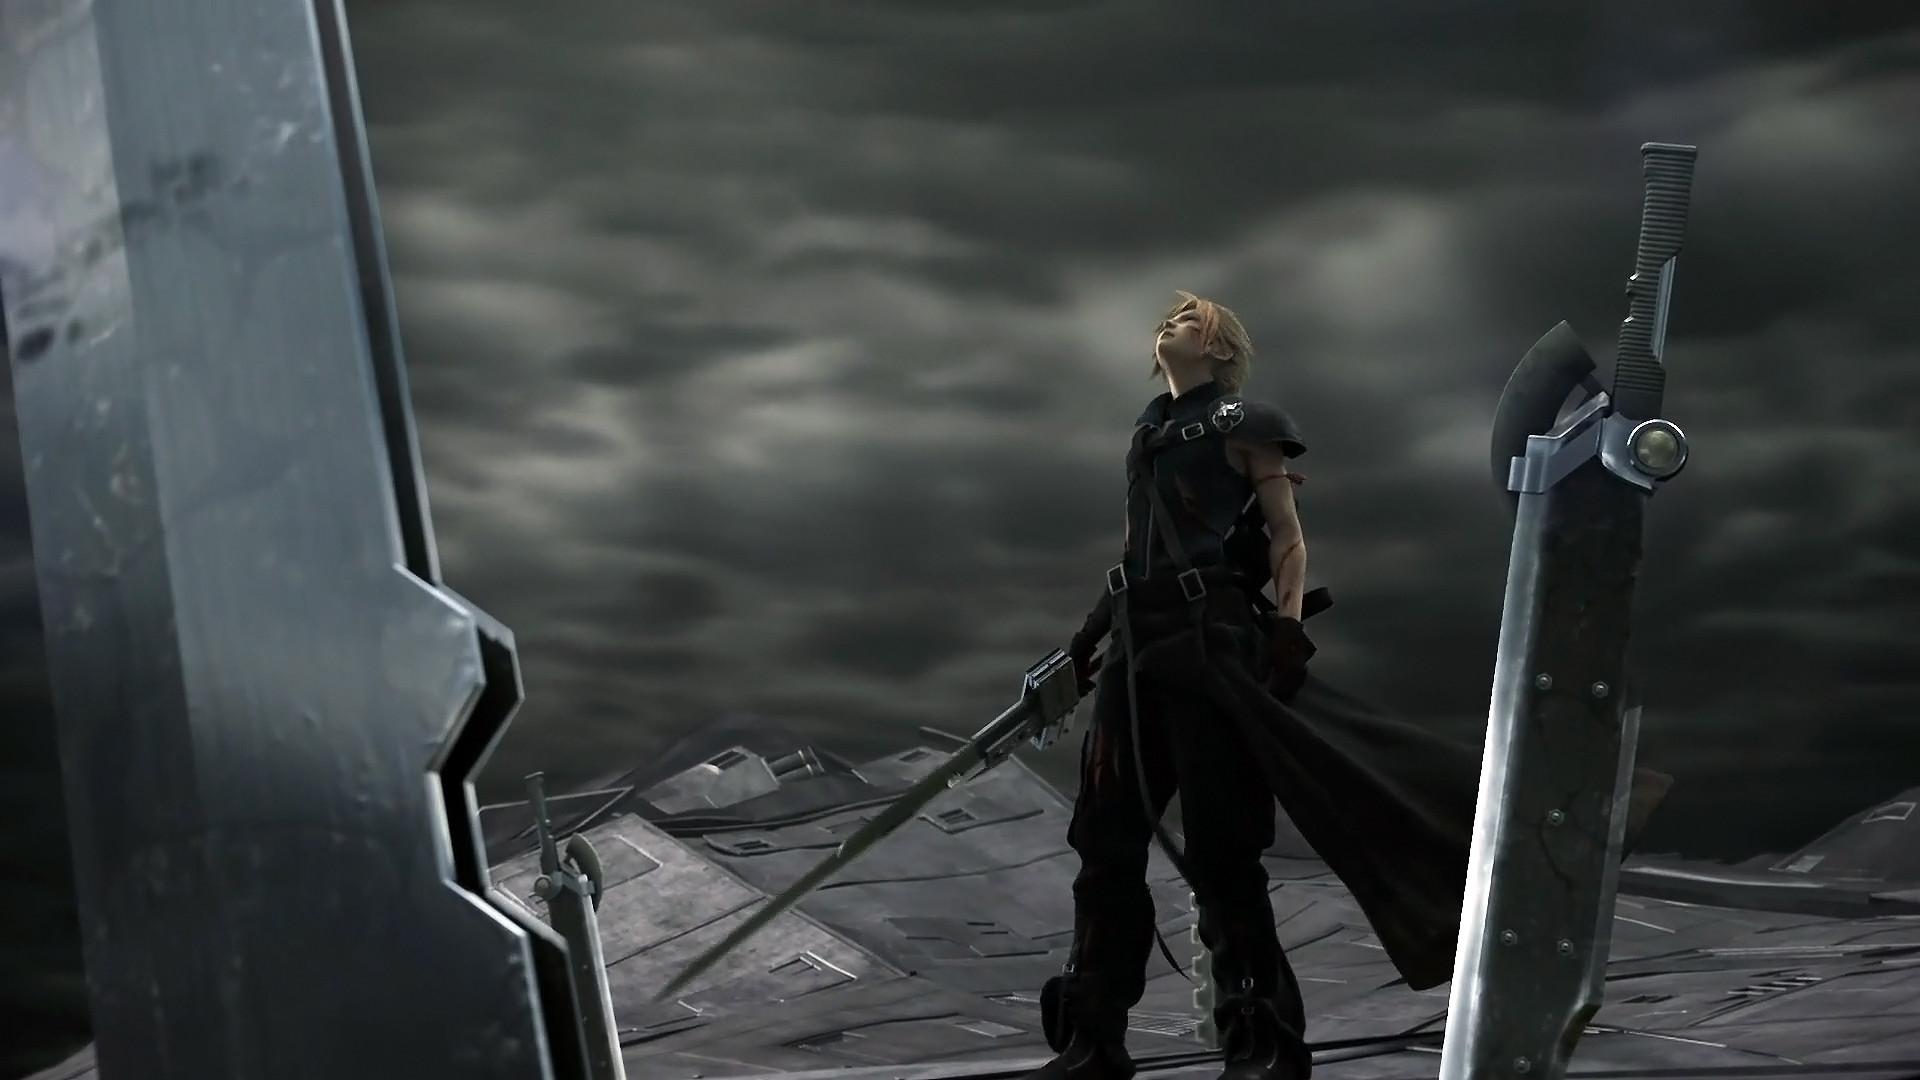 Tags: Anime, Nomura Tetsuya, Final Fantasy VII, Cloud Strife, Buster Sword